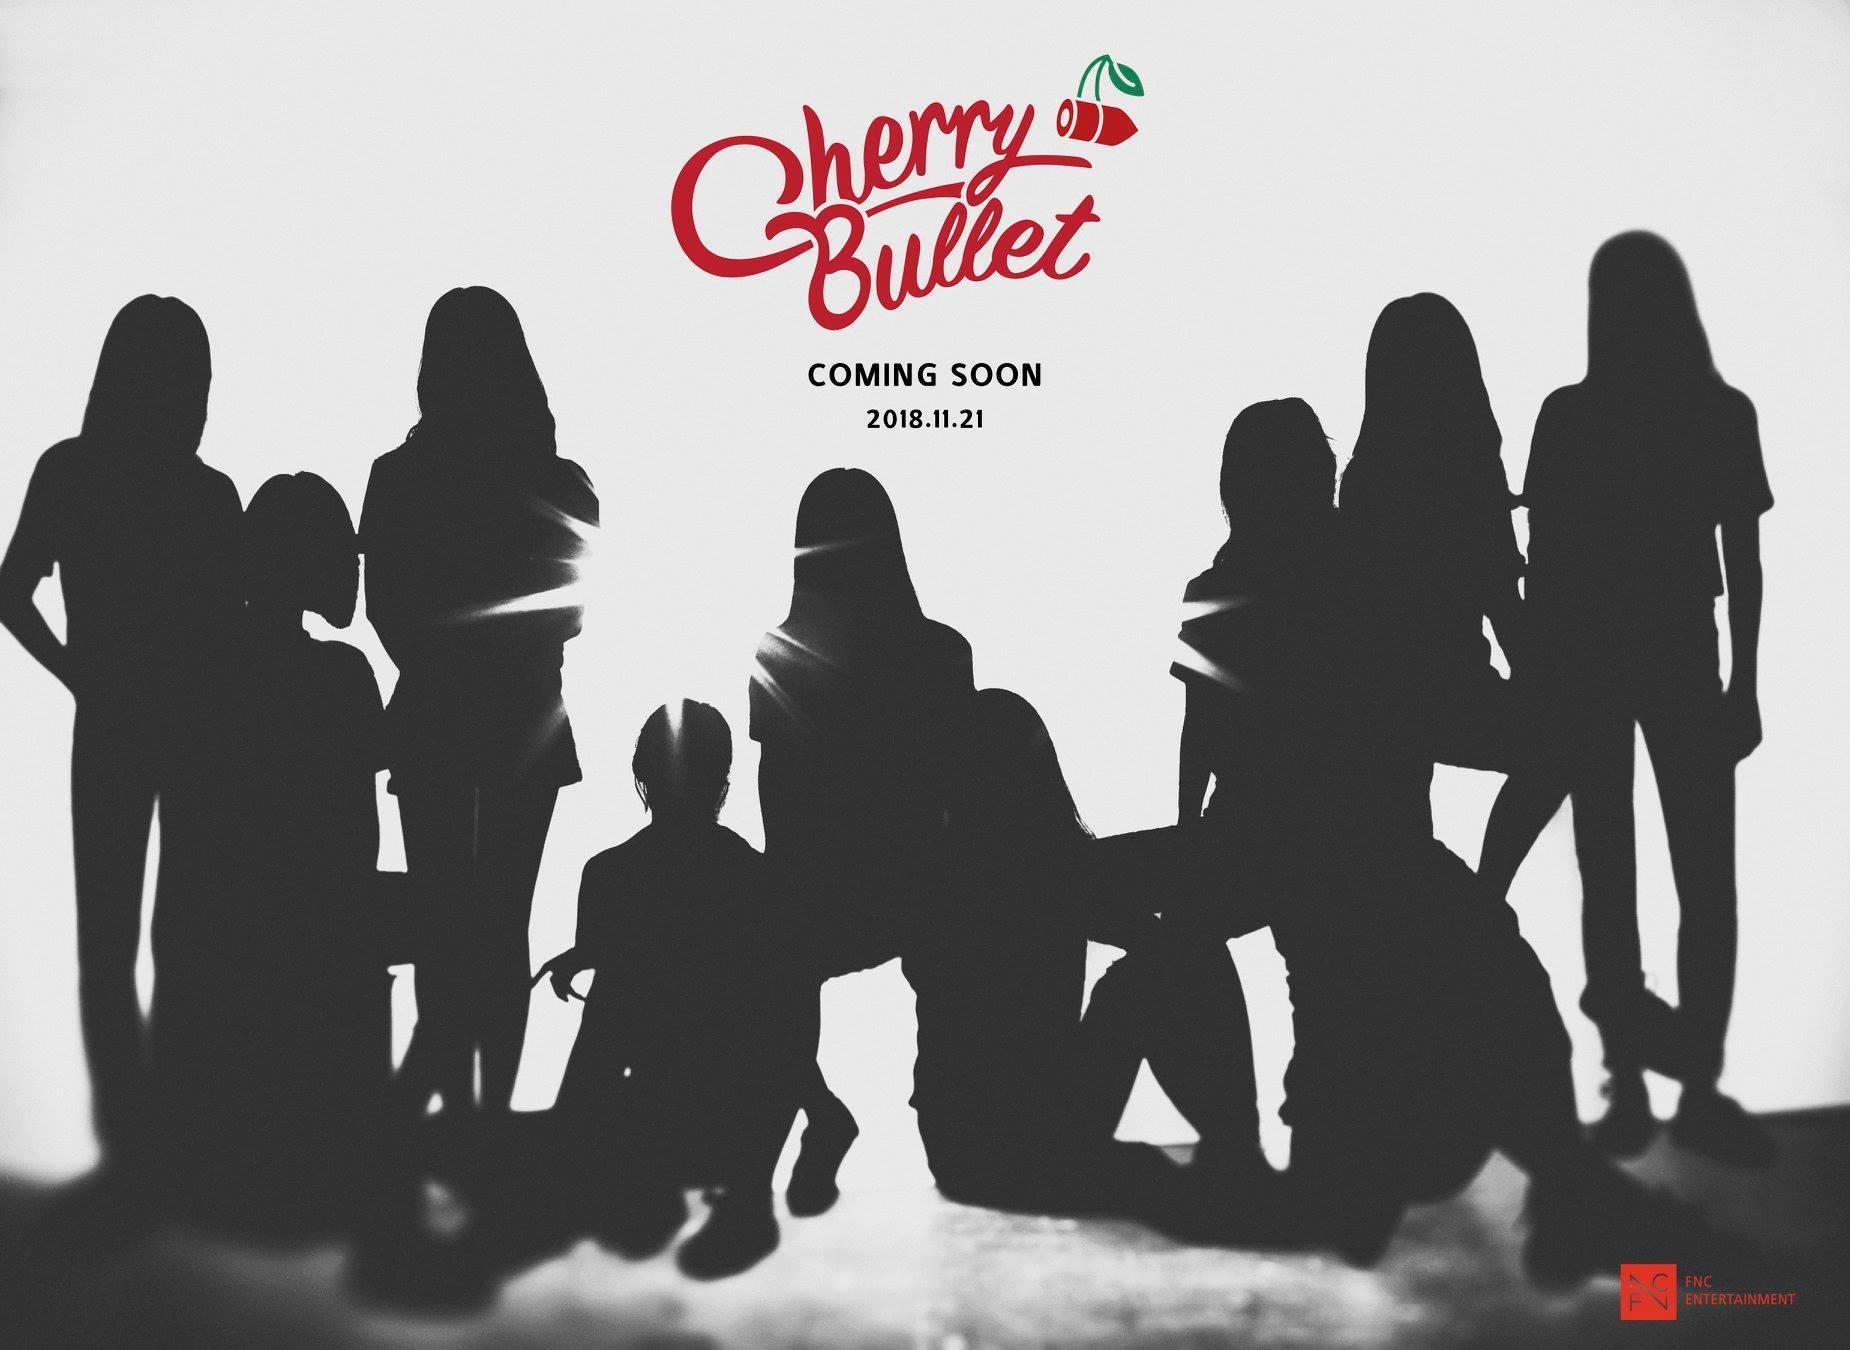 FNC娛樂即將推出十人女子組合「Cherry Bullet」,官方也從21日開始陸續公開成員們的個人宣傳照,引發粉絲高度期待。